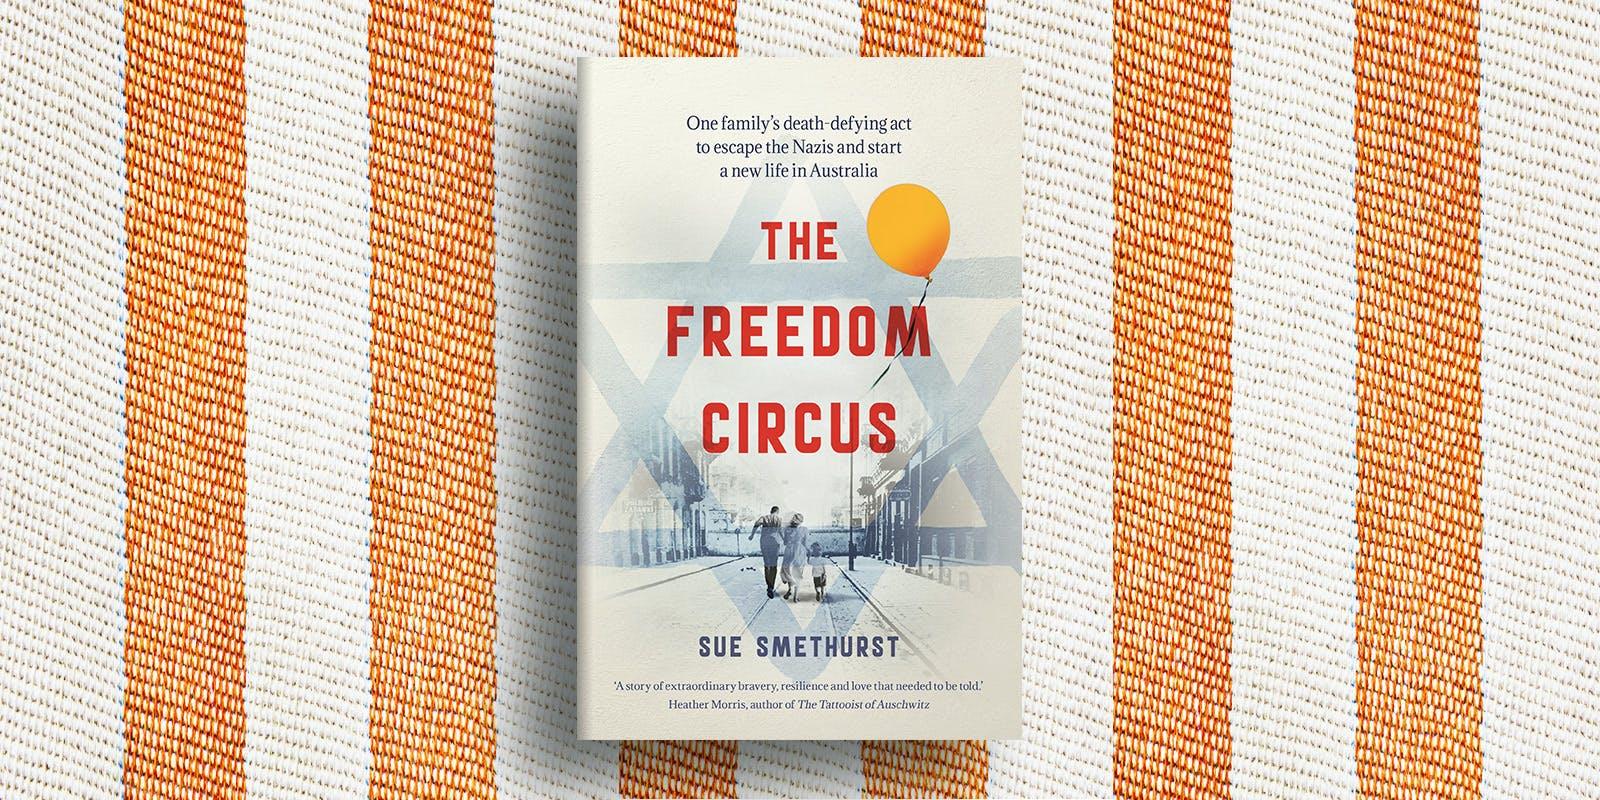 The Freedom Circus photo album